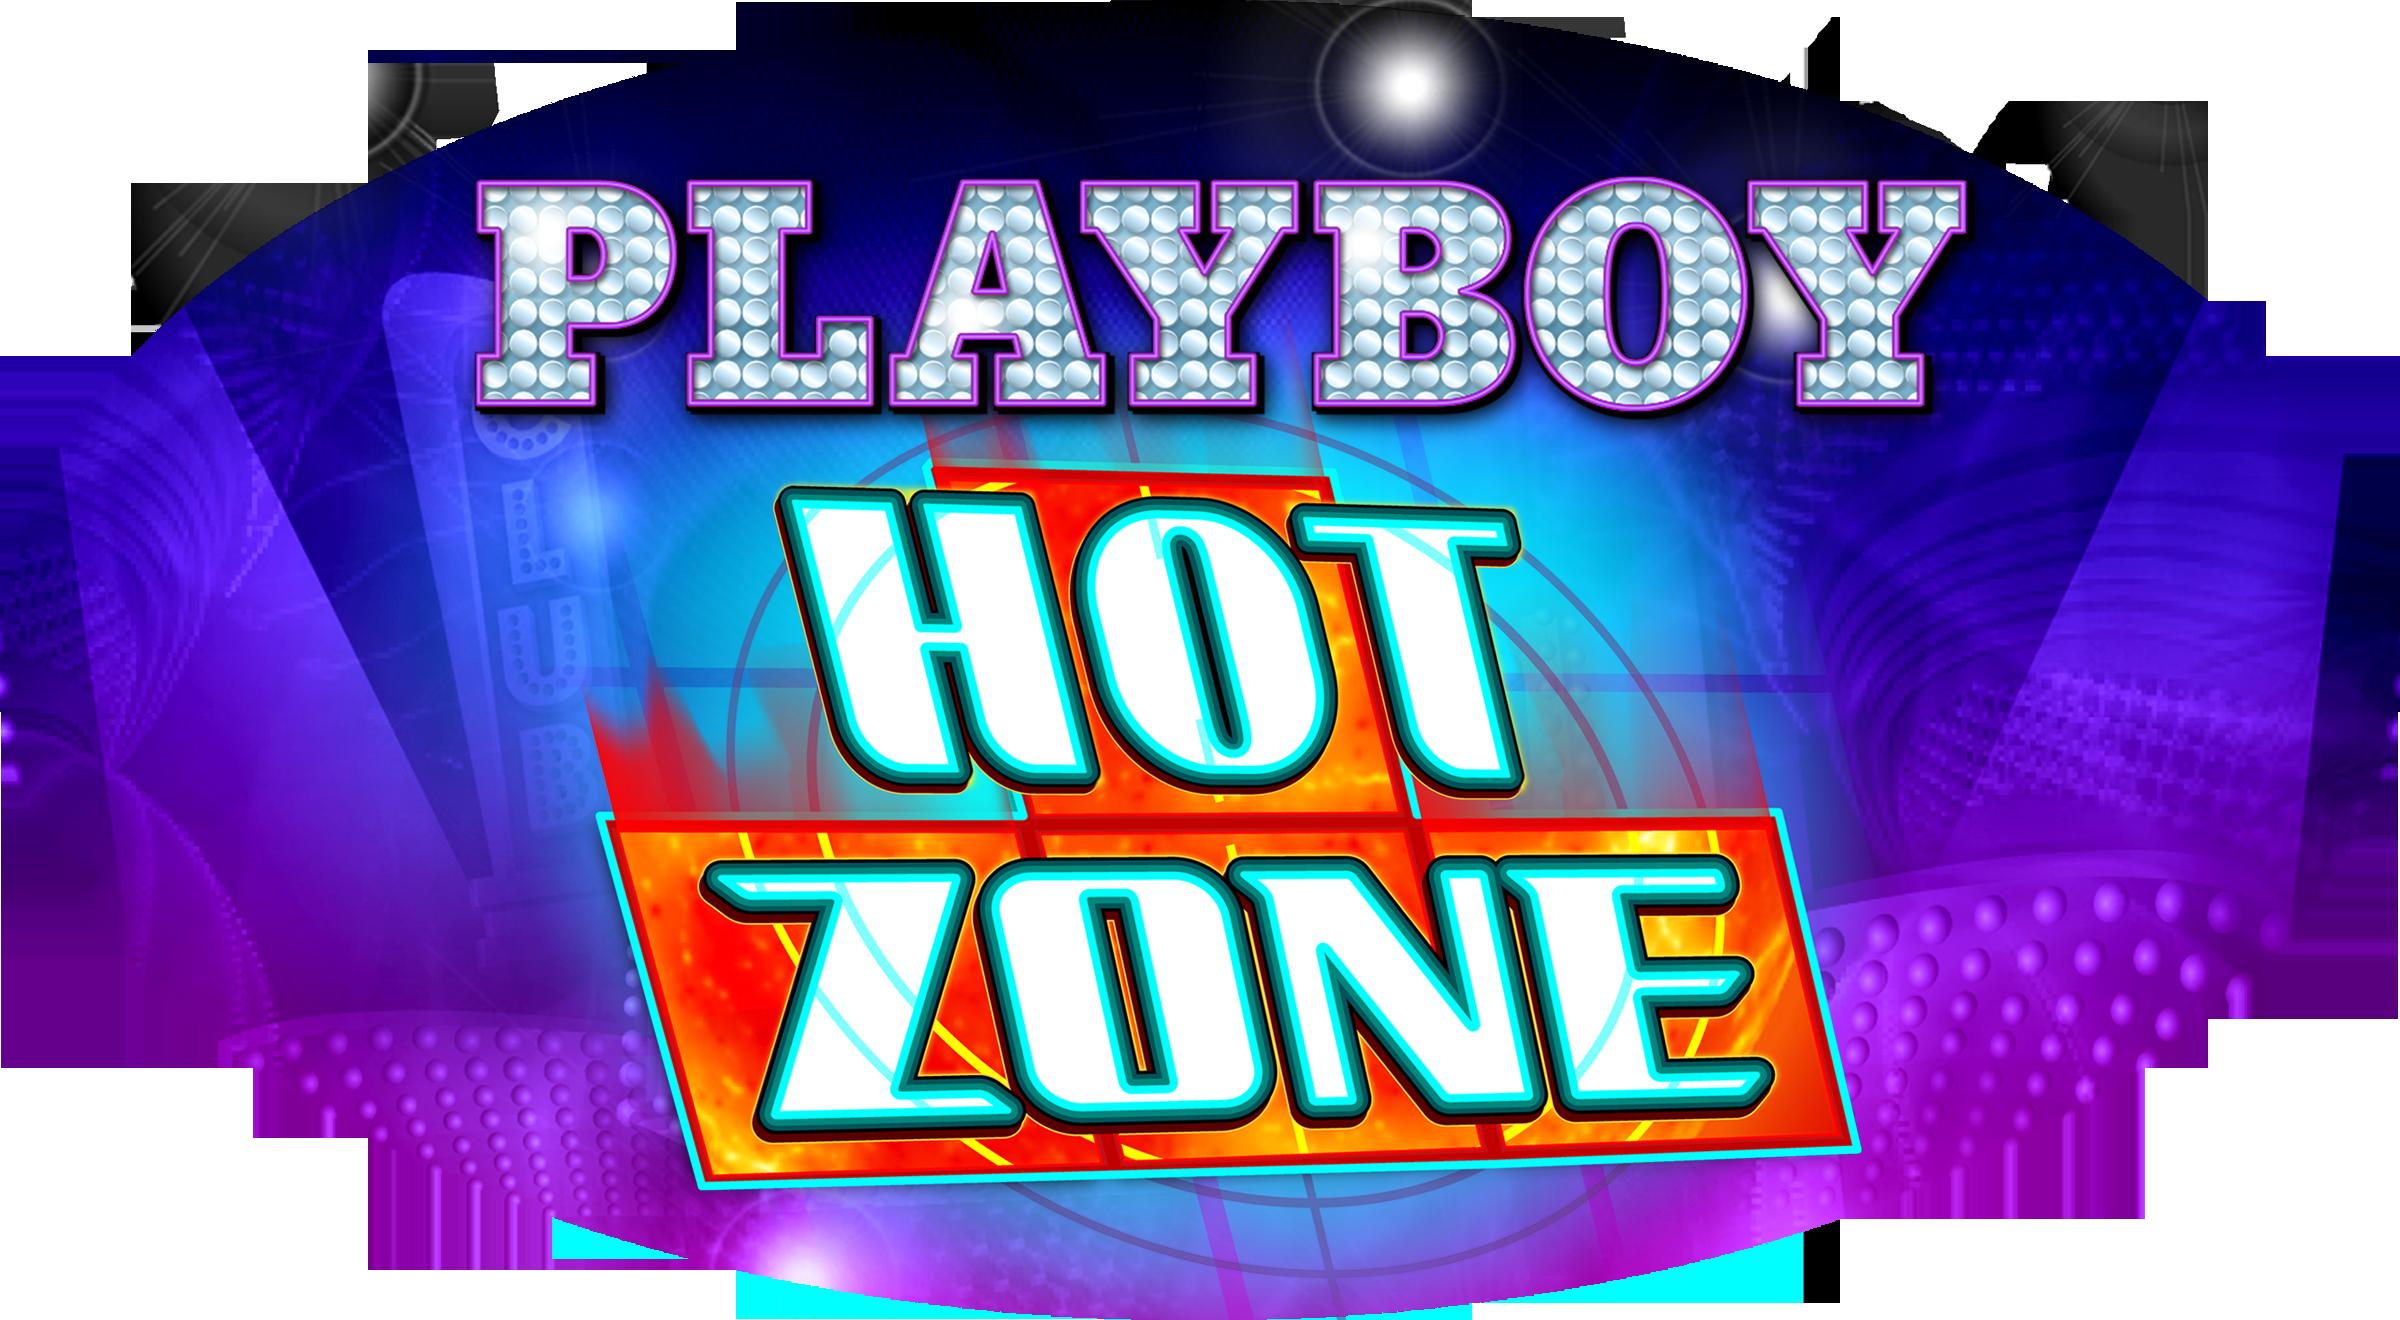 Playboy Hot Zone™ Bally Technologies videogaming slots